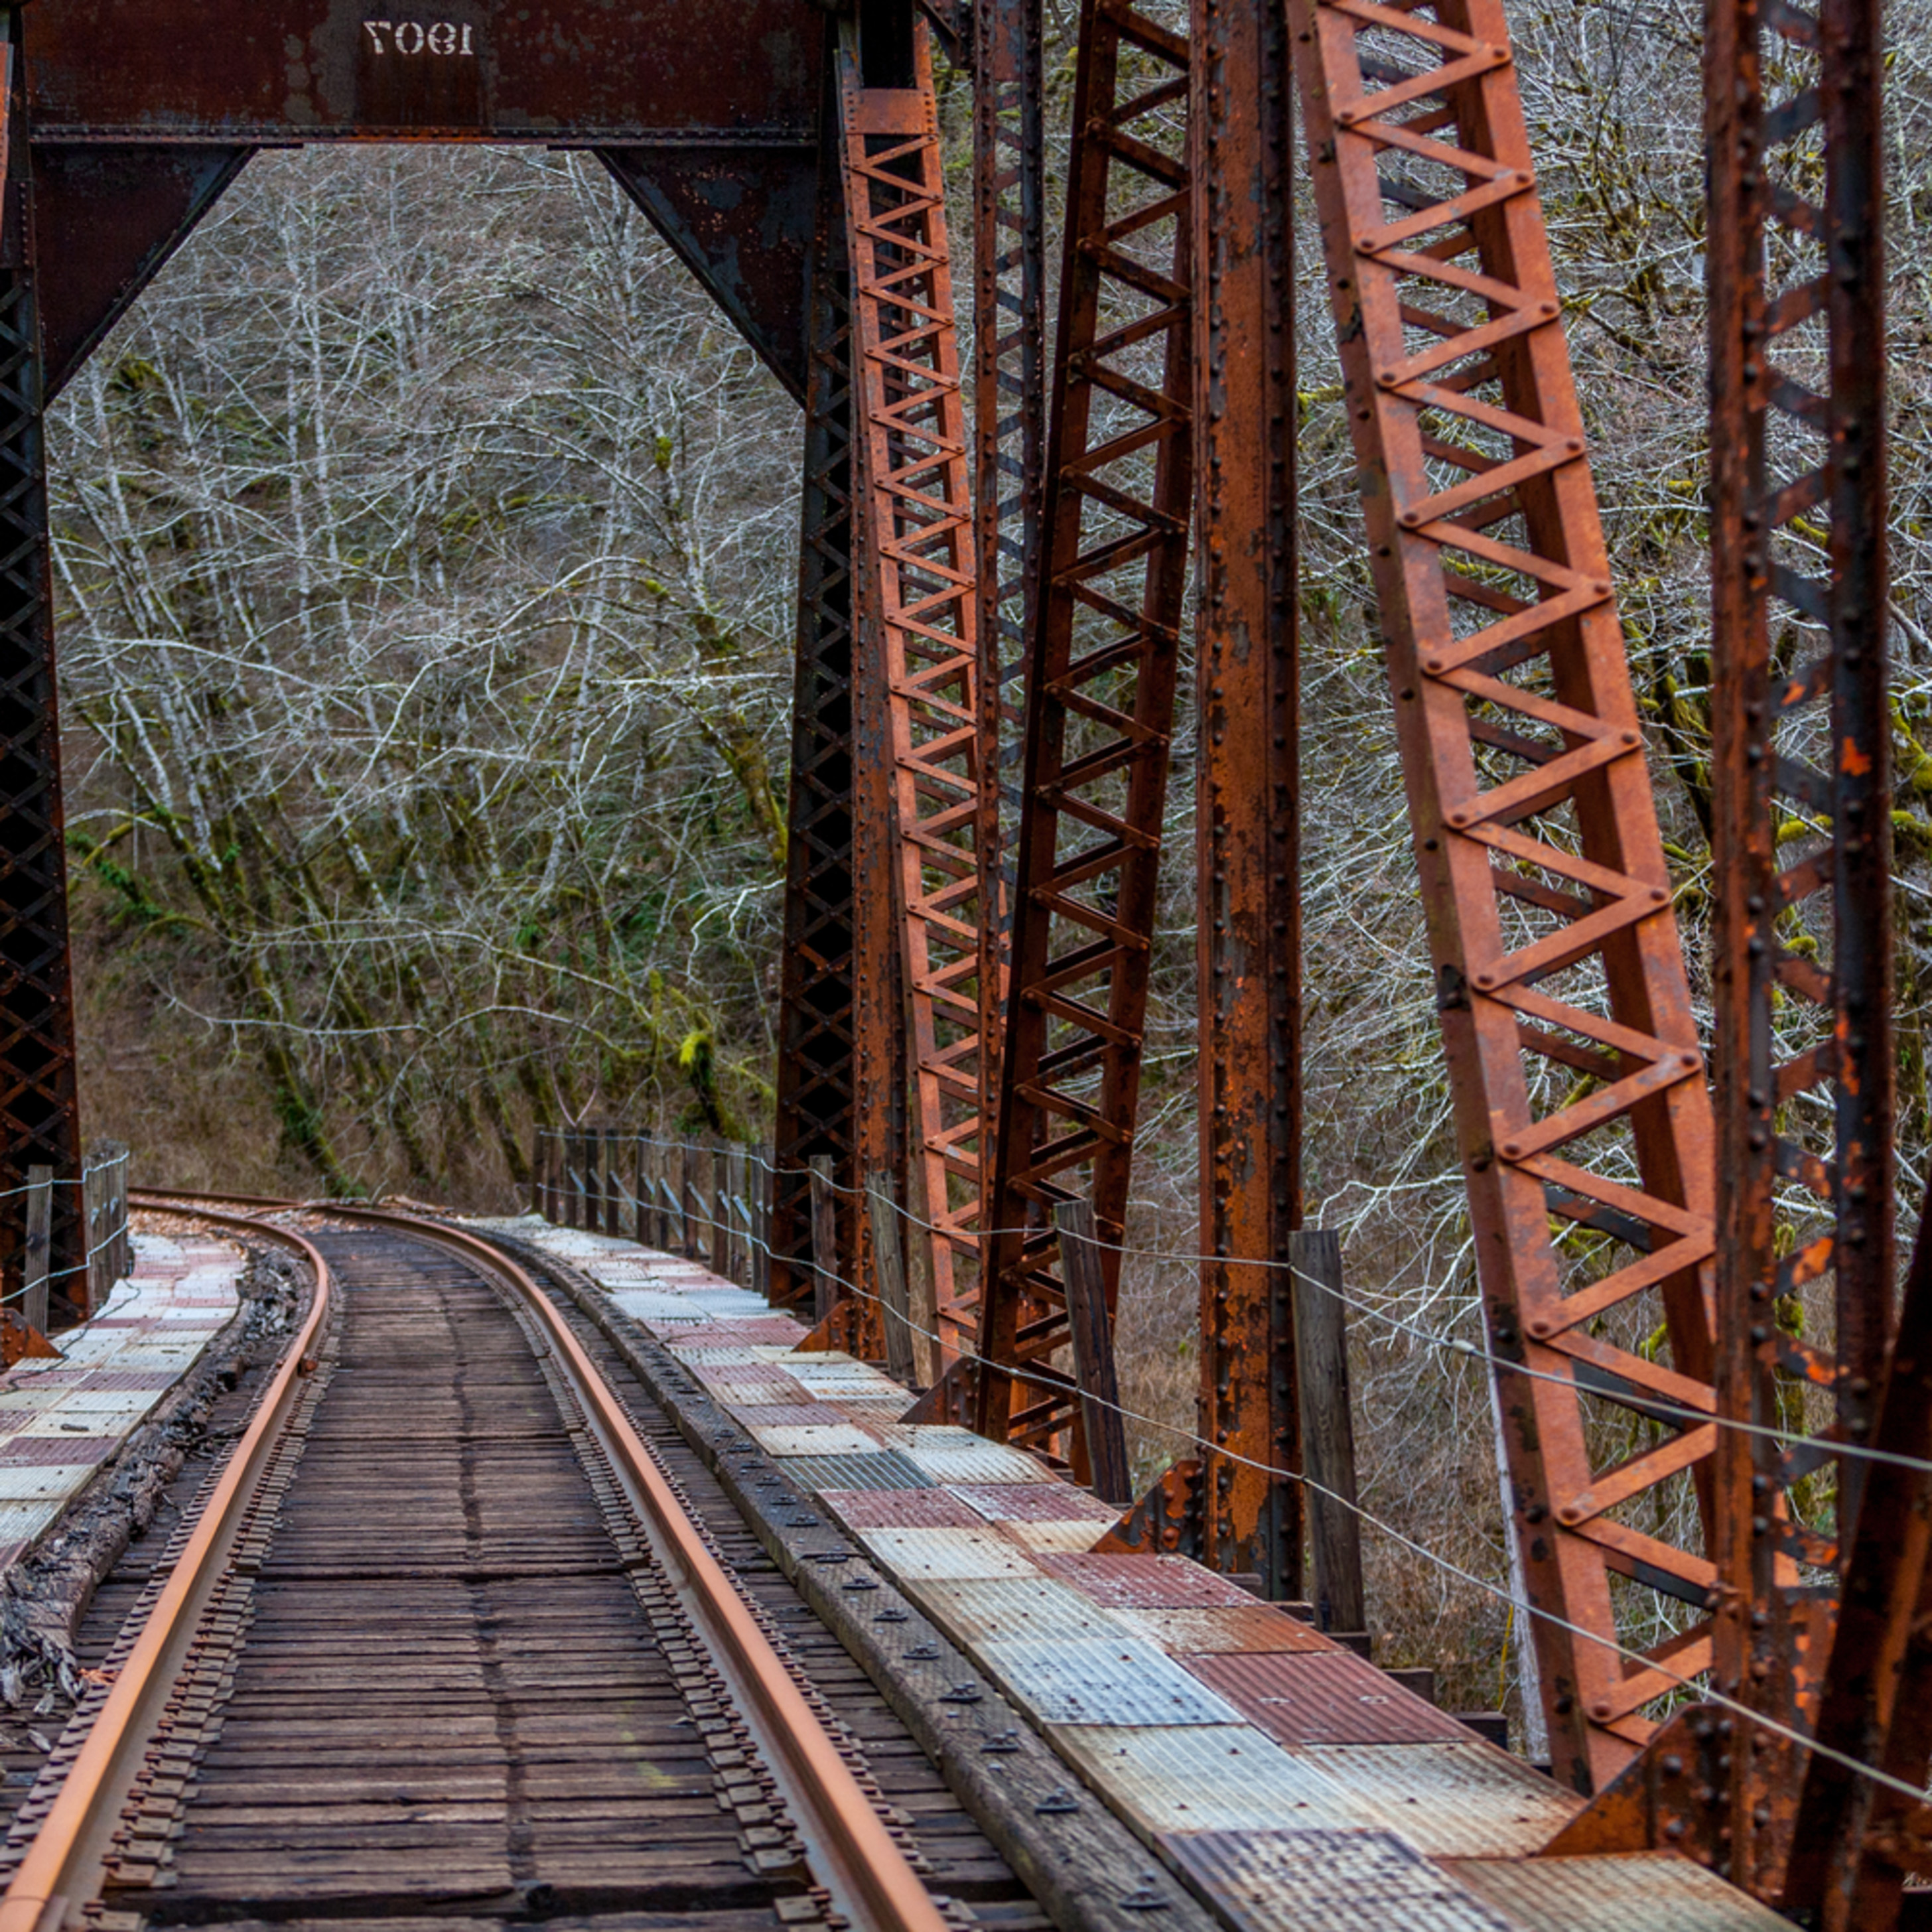 Asf railroad 9767 kuptlx